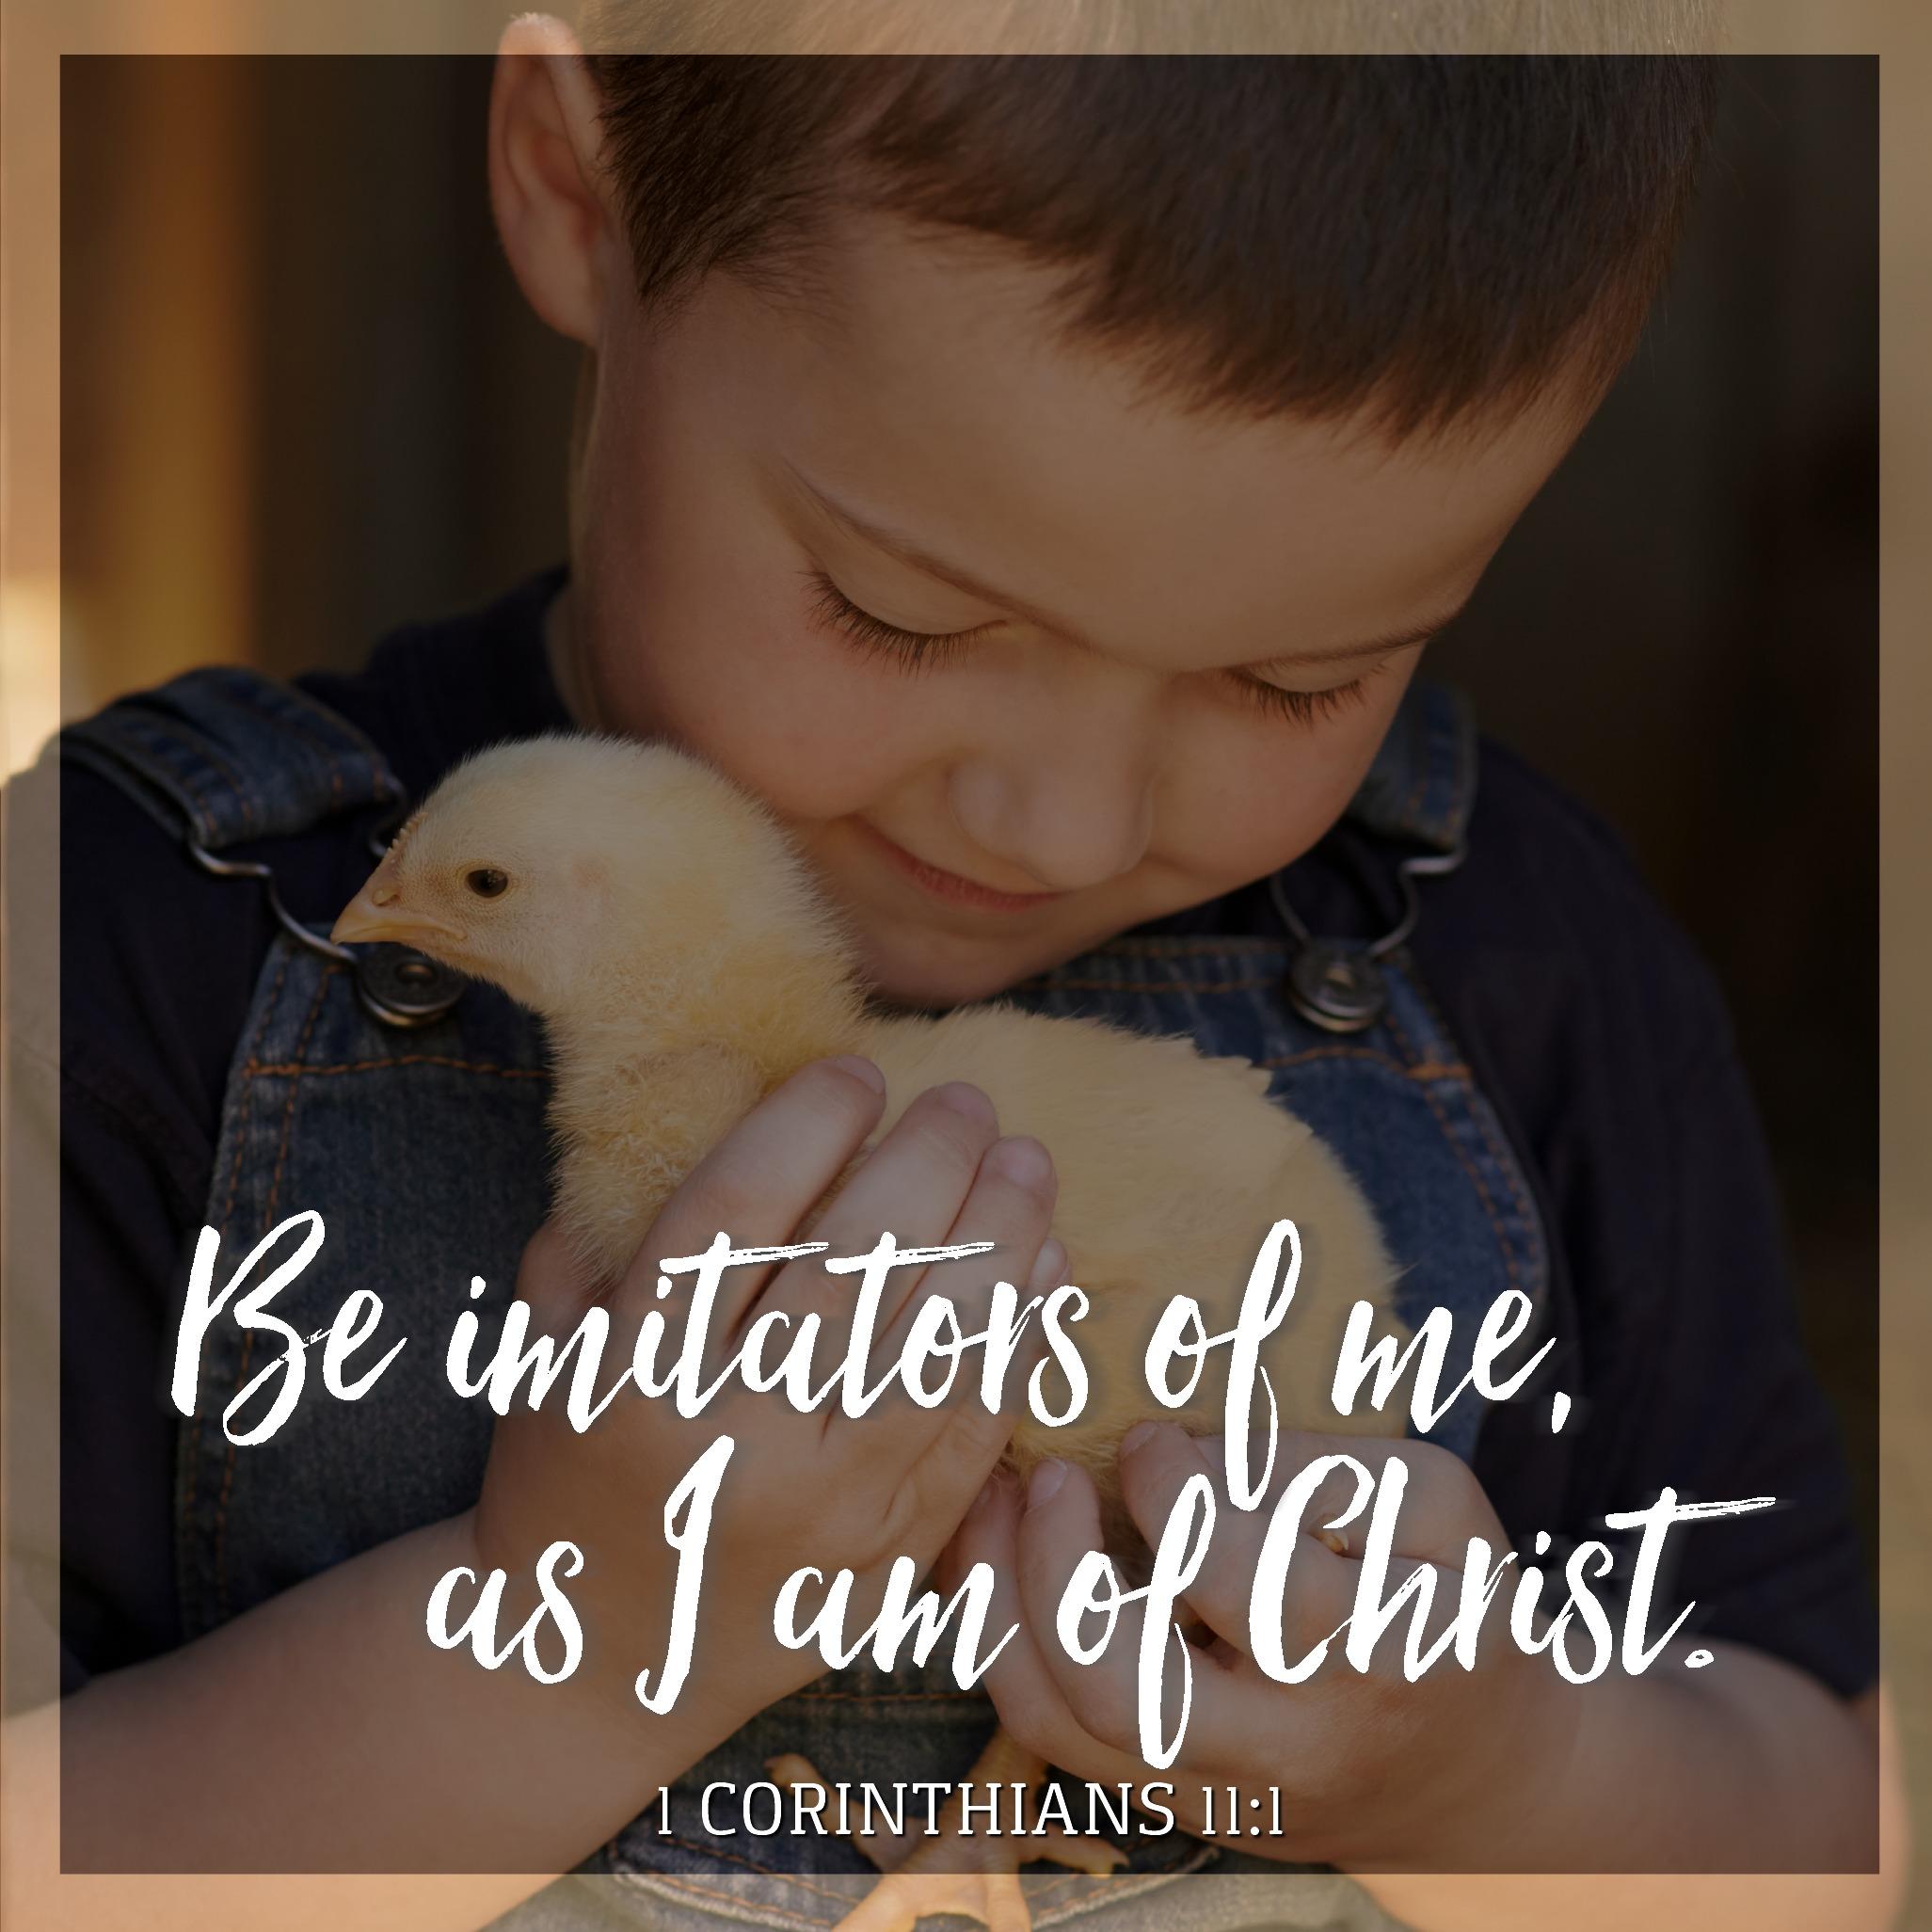 1 Corinthians 11:1